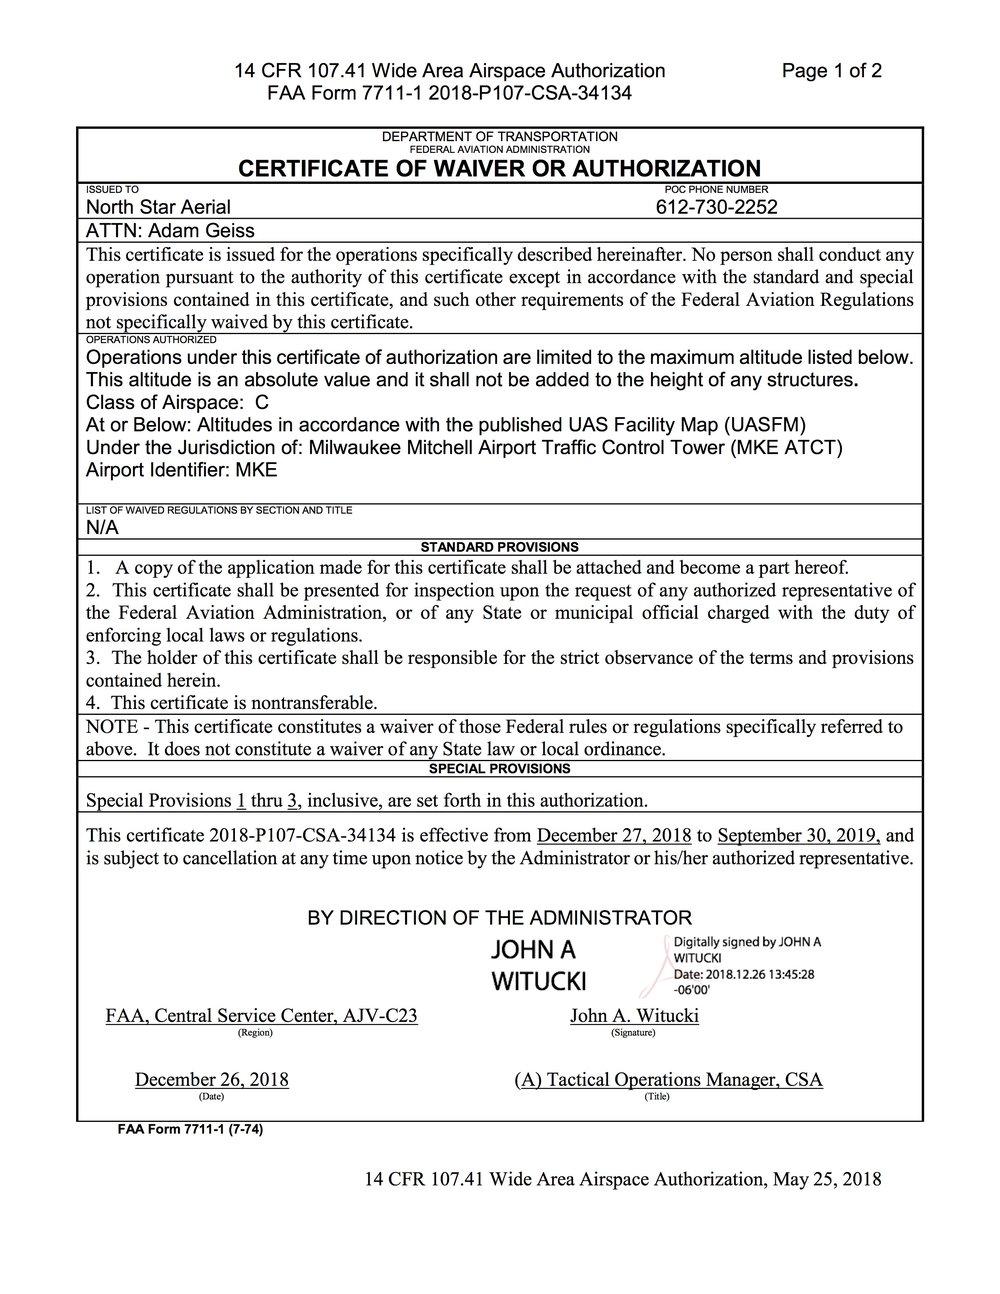 FAA Form 7711-1 2018-P107-CSA-34134 MKE.jpg